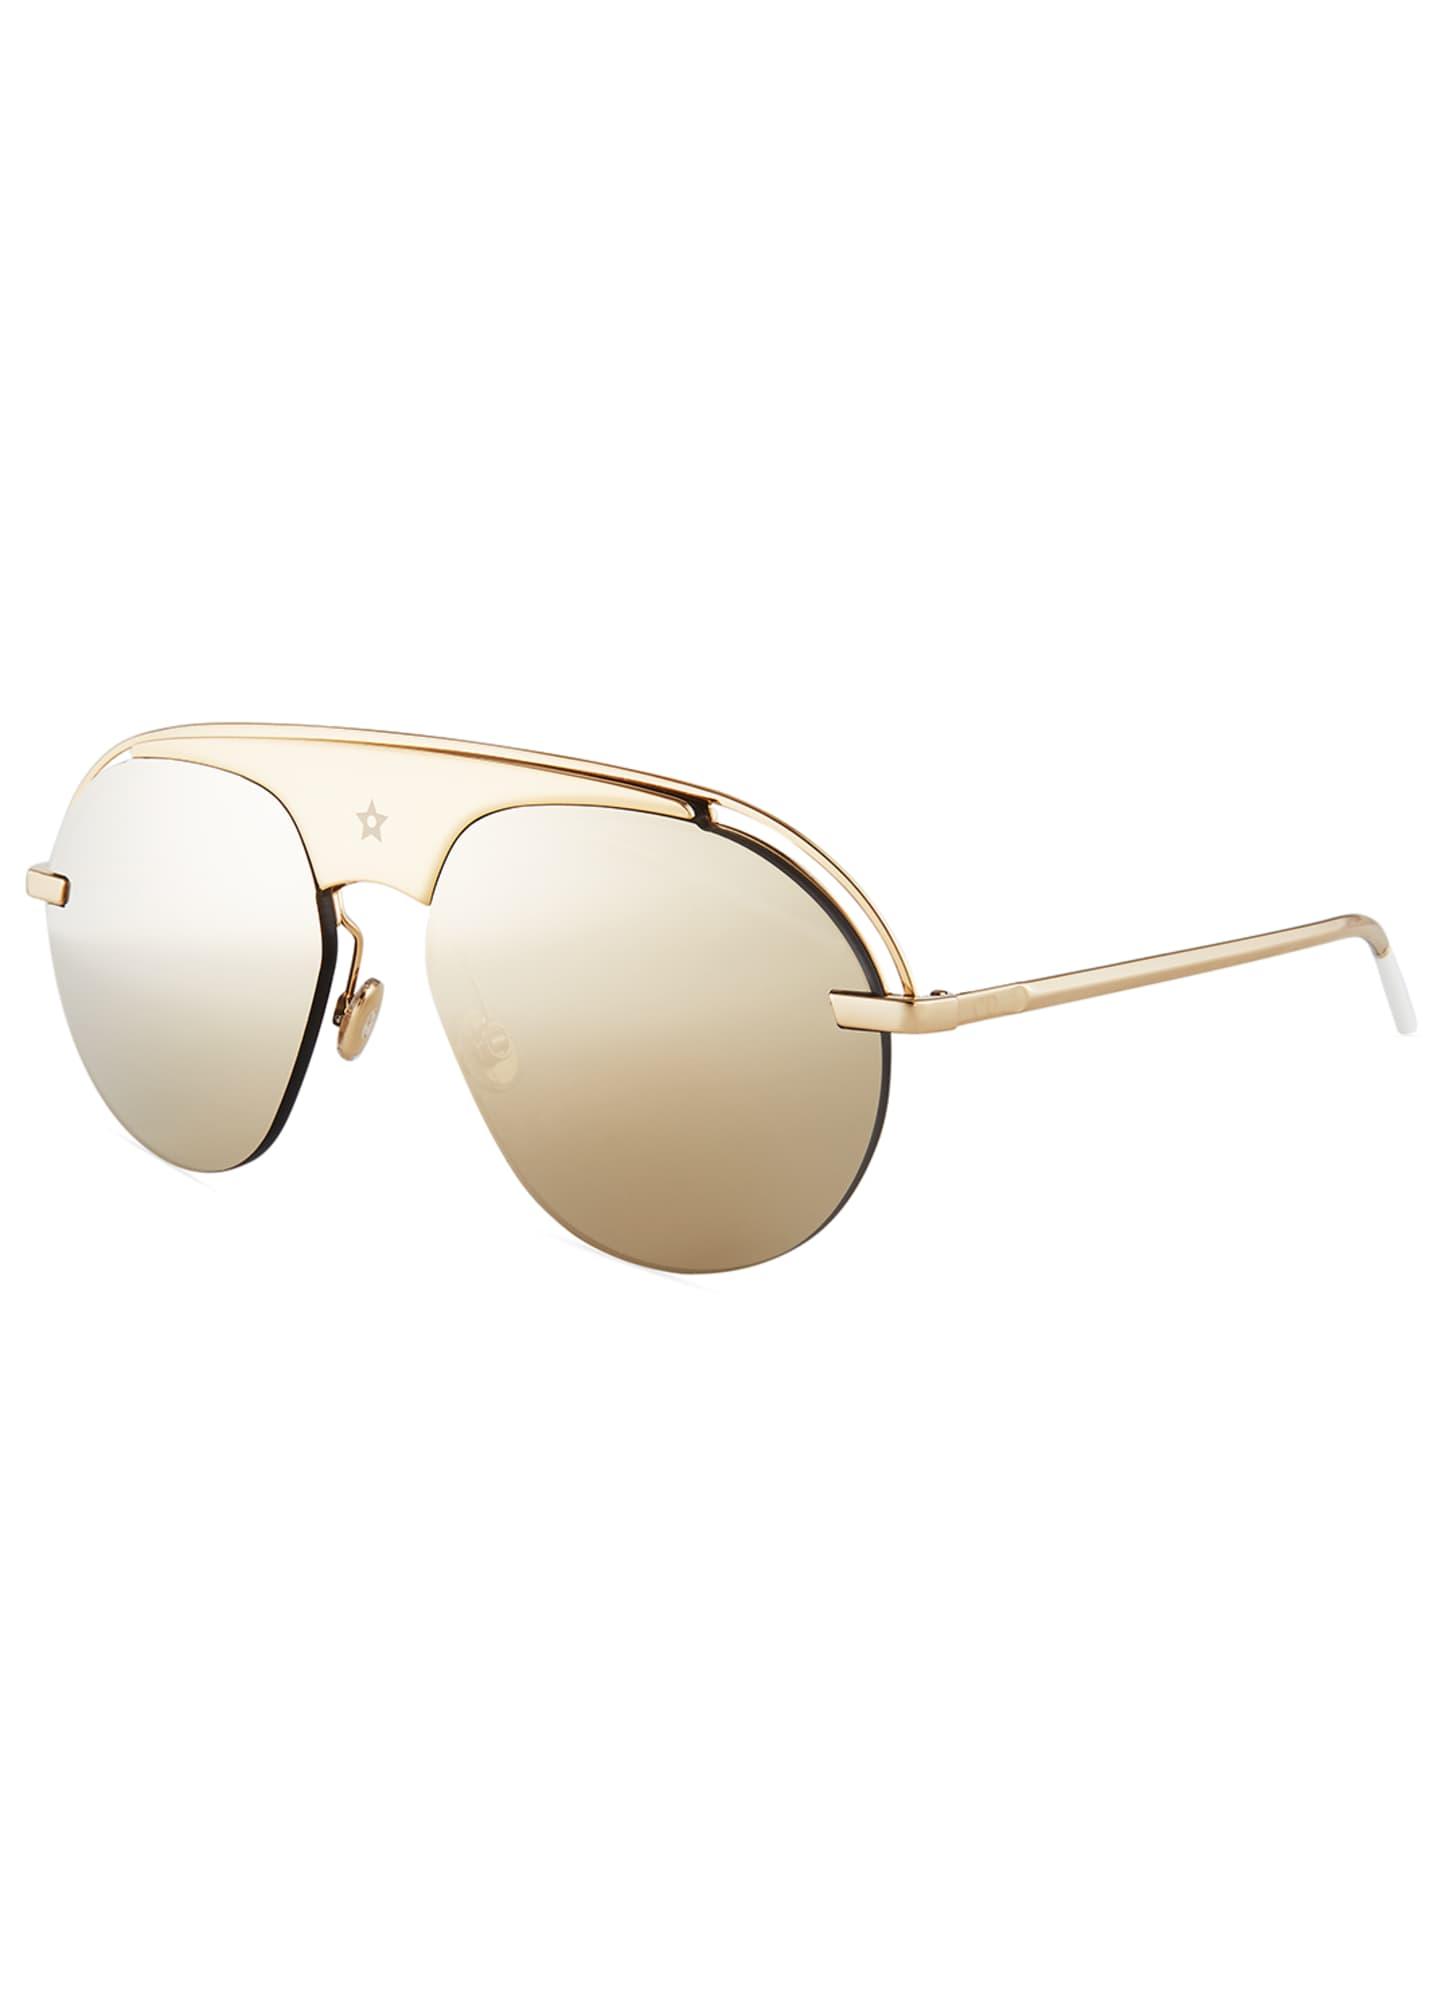 Dior Dio(R)evolution Mirrored Aviator Sunglasses